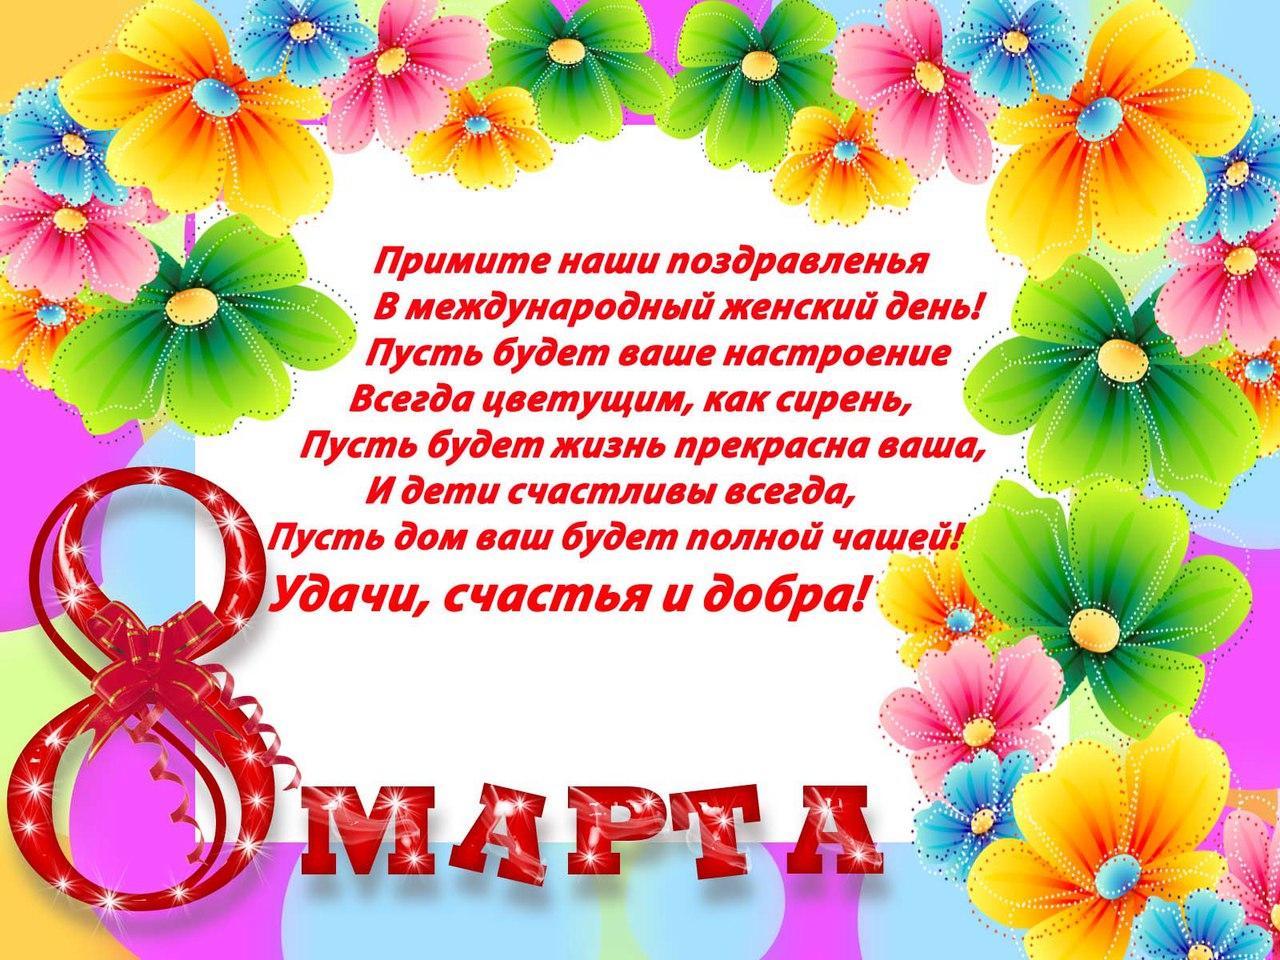 https://pp.userapi.com/c837222/v837222118/2bd02/WgFN-4eh0-M.jpg